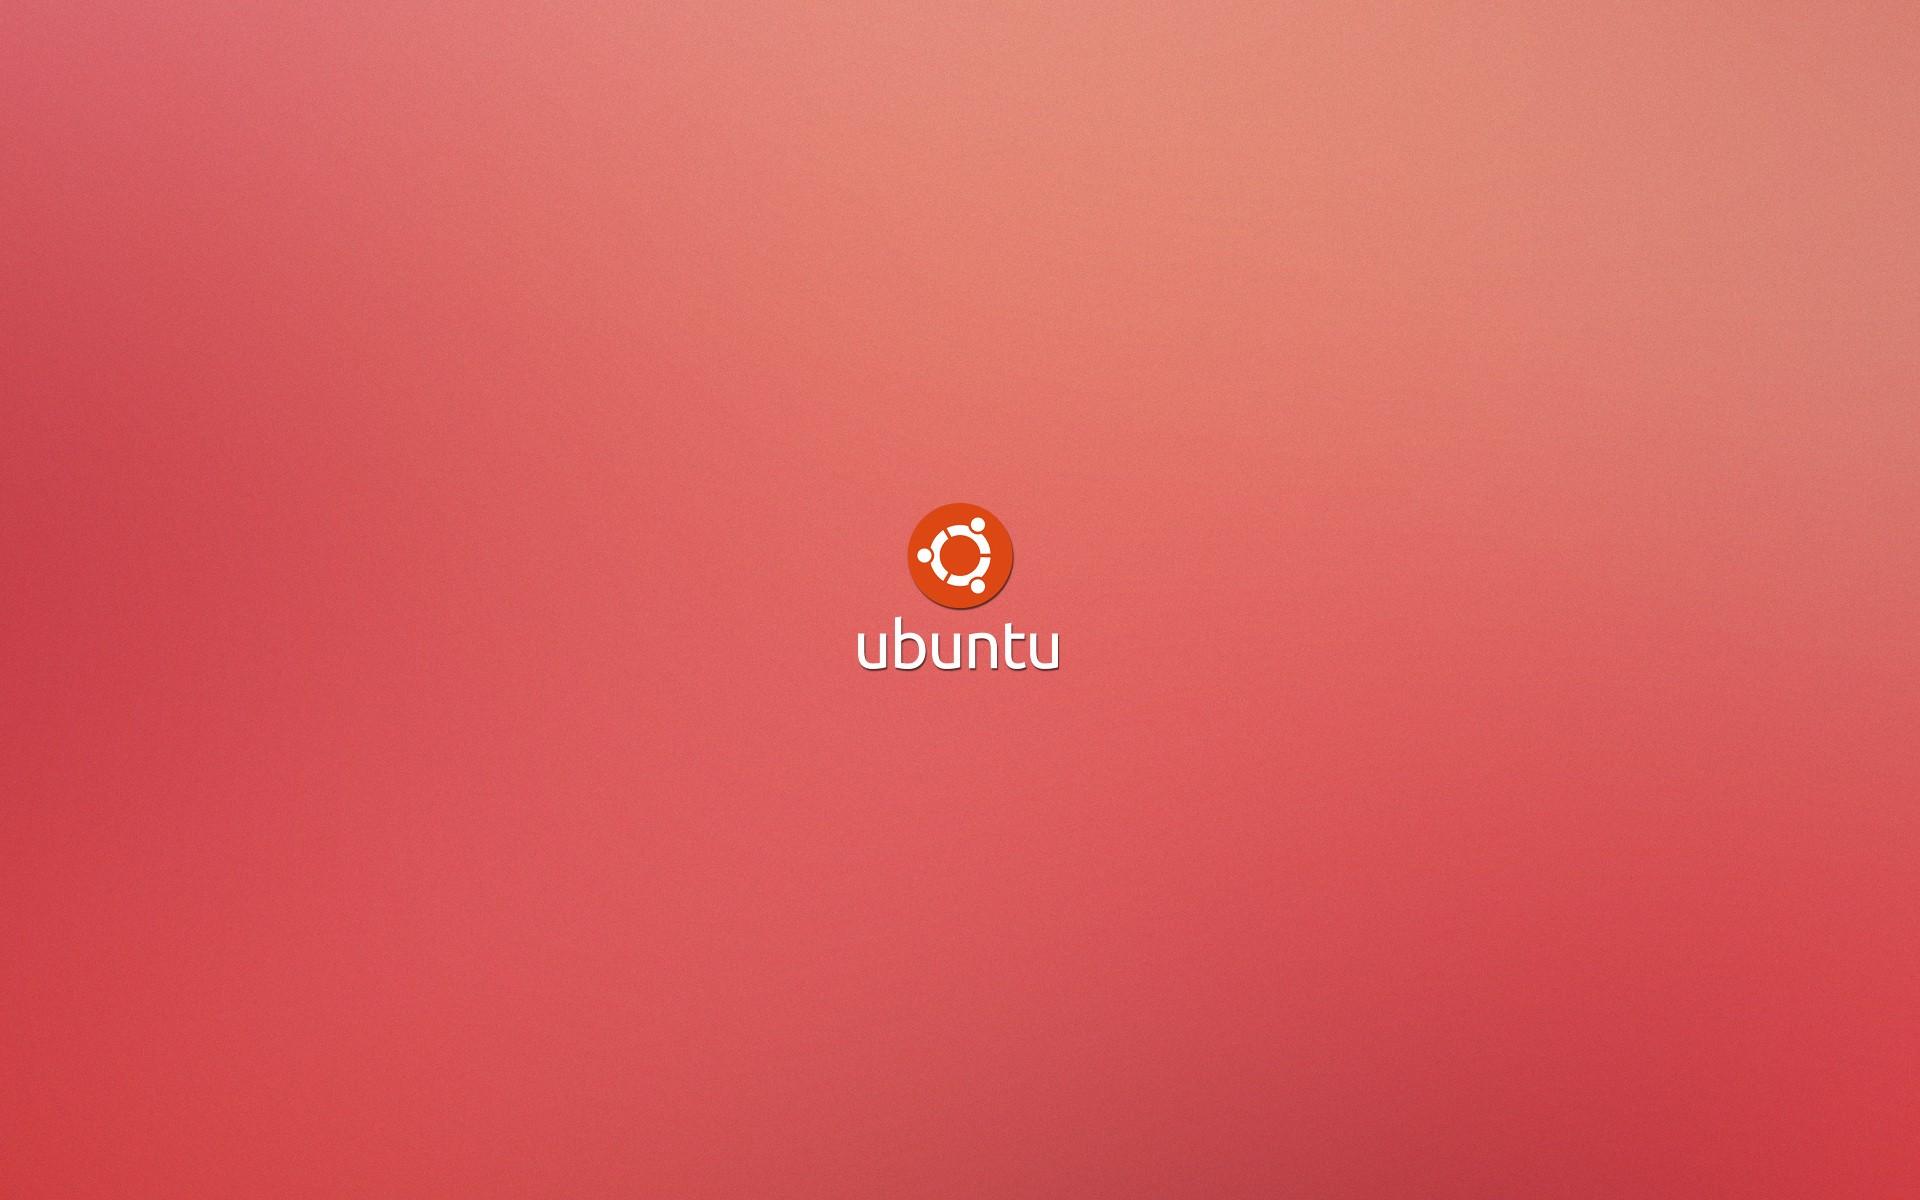 Ubuntu fondo color rosa - 1920x1200